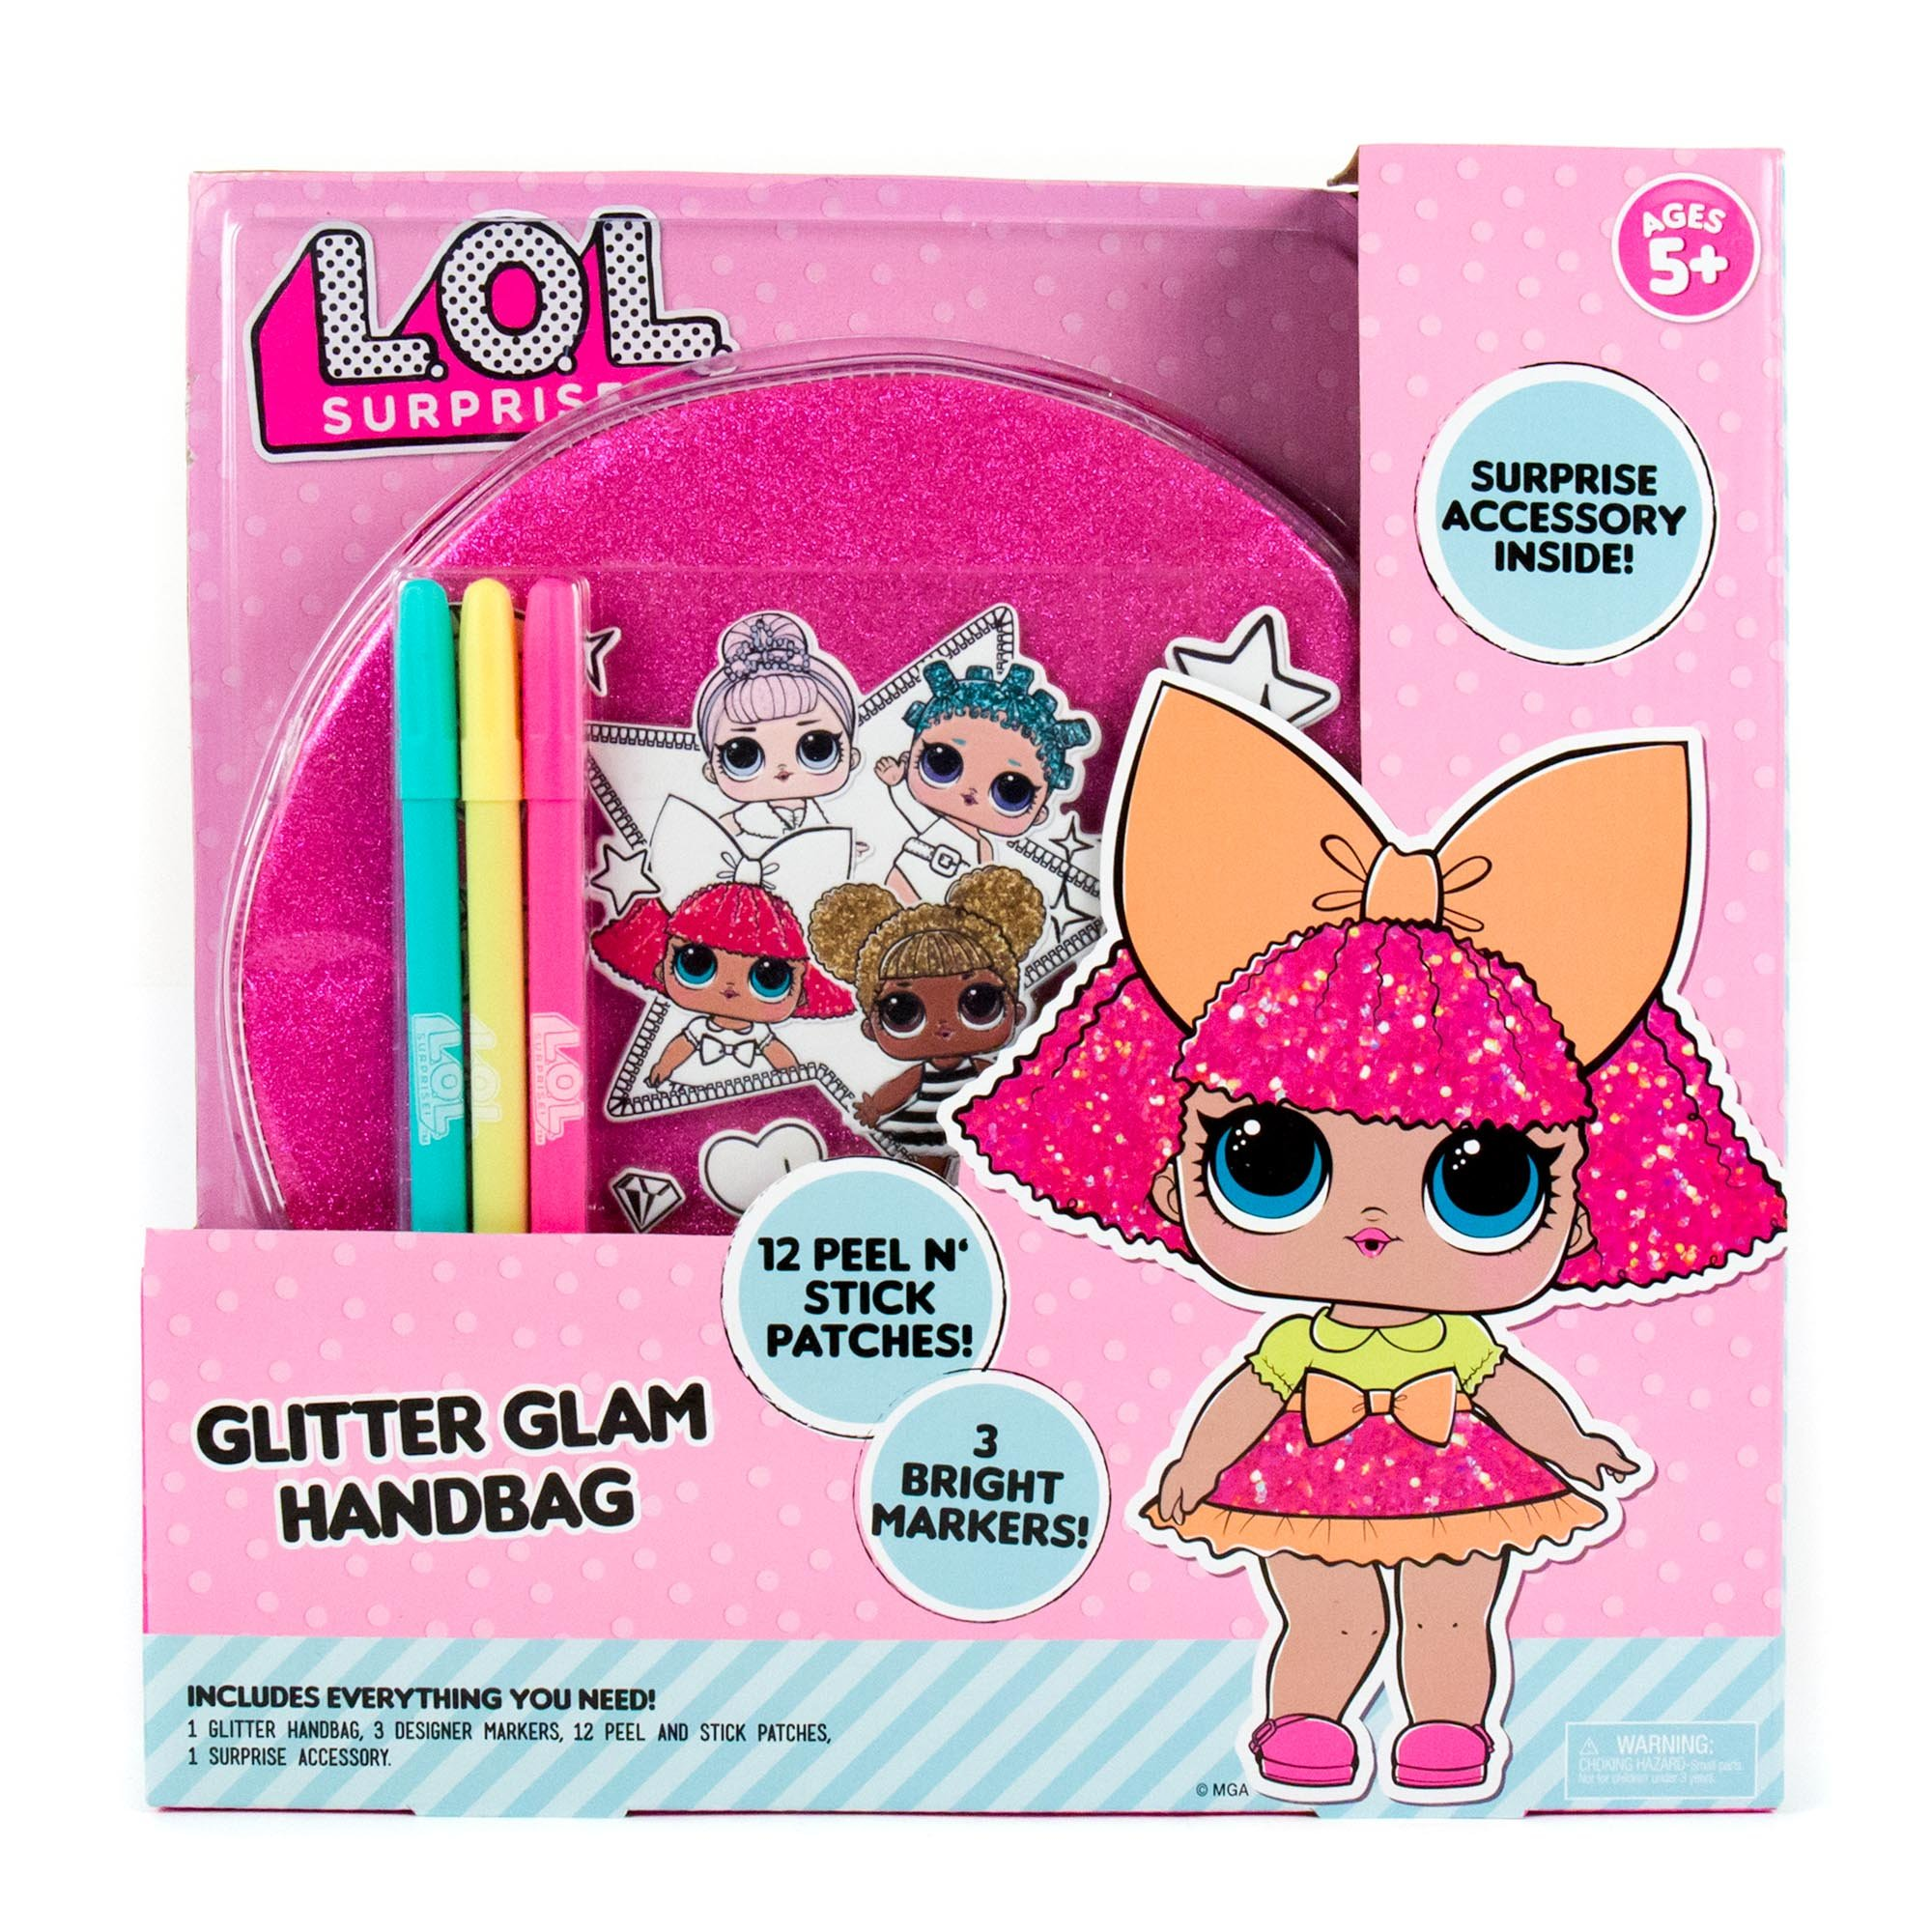 L.O.L. Surprise Glitter Glam Bag by Horizon Group USA